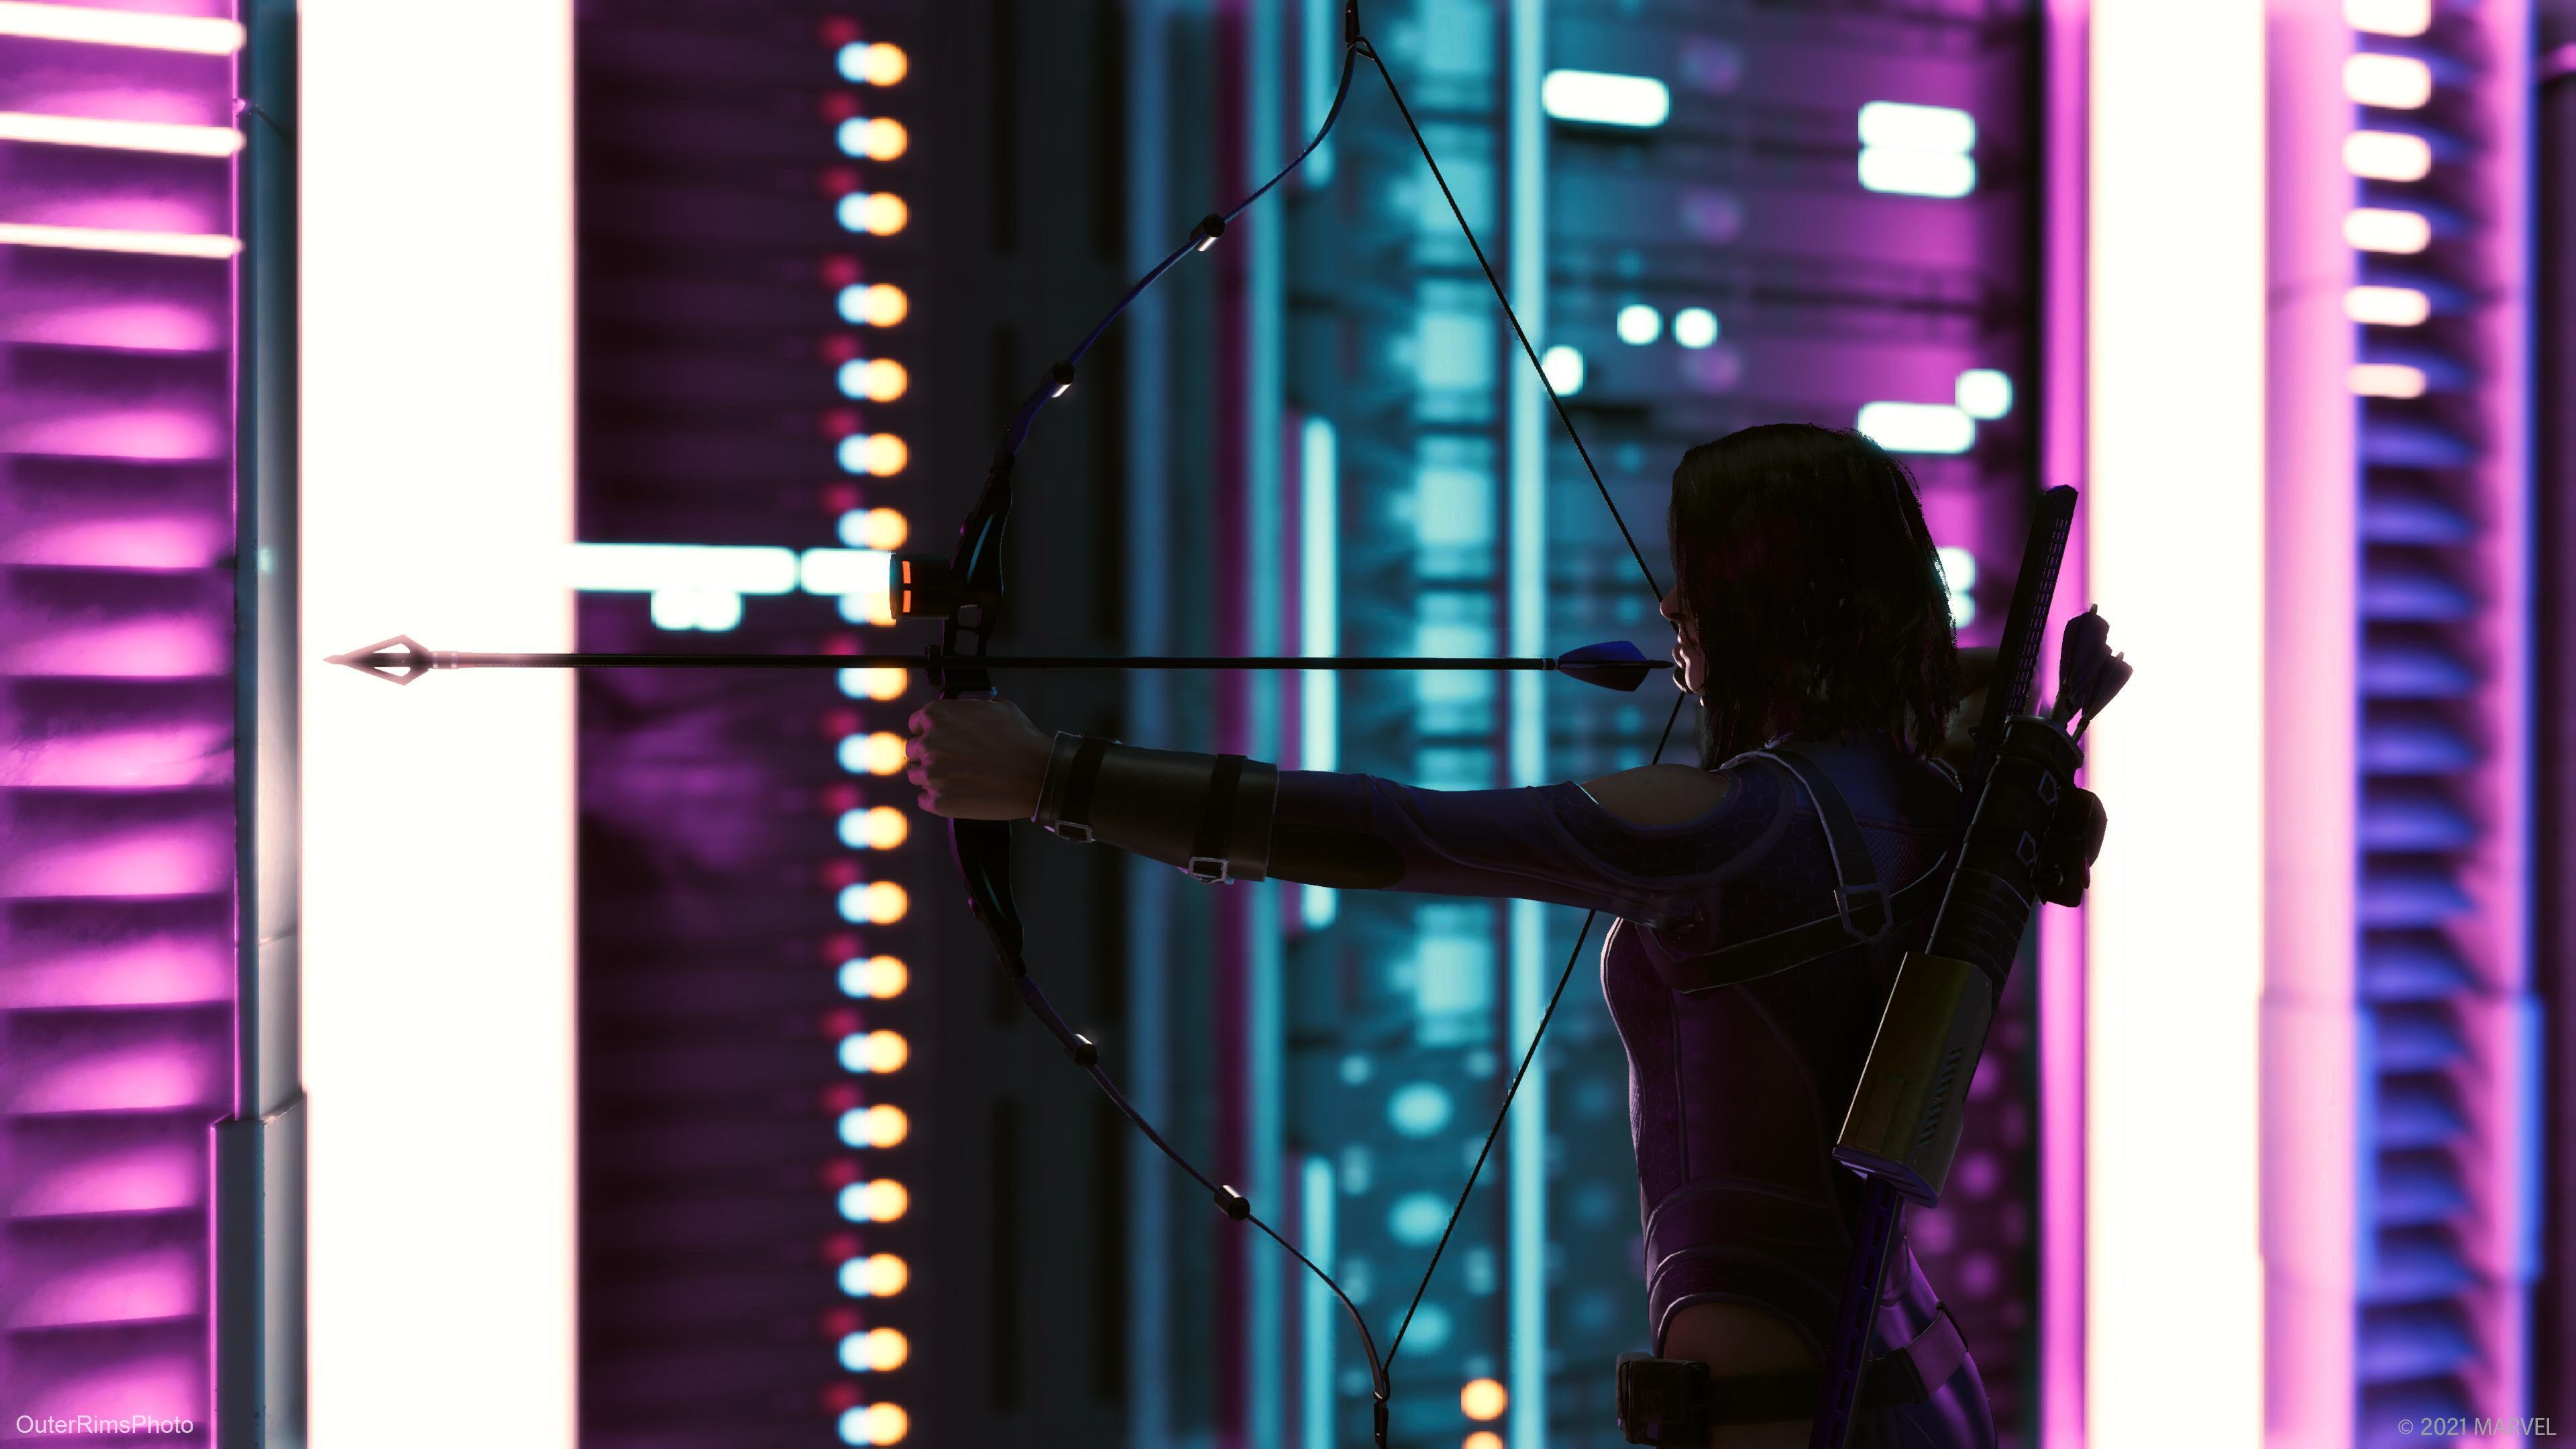 a photo mode screenshot of Kate-Hawkeye drawing her bow